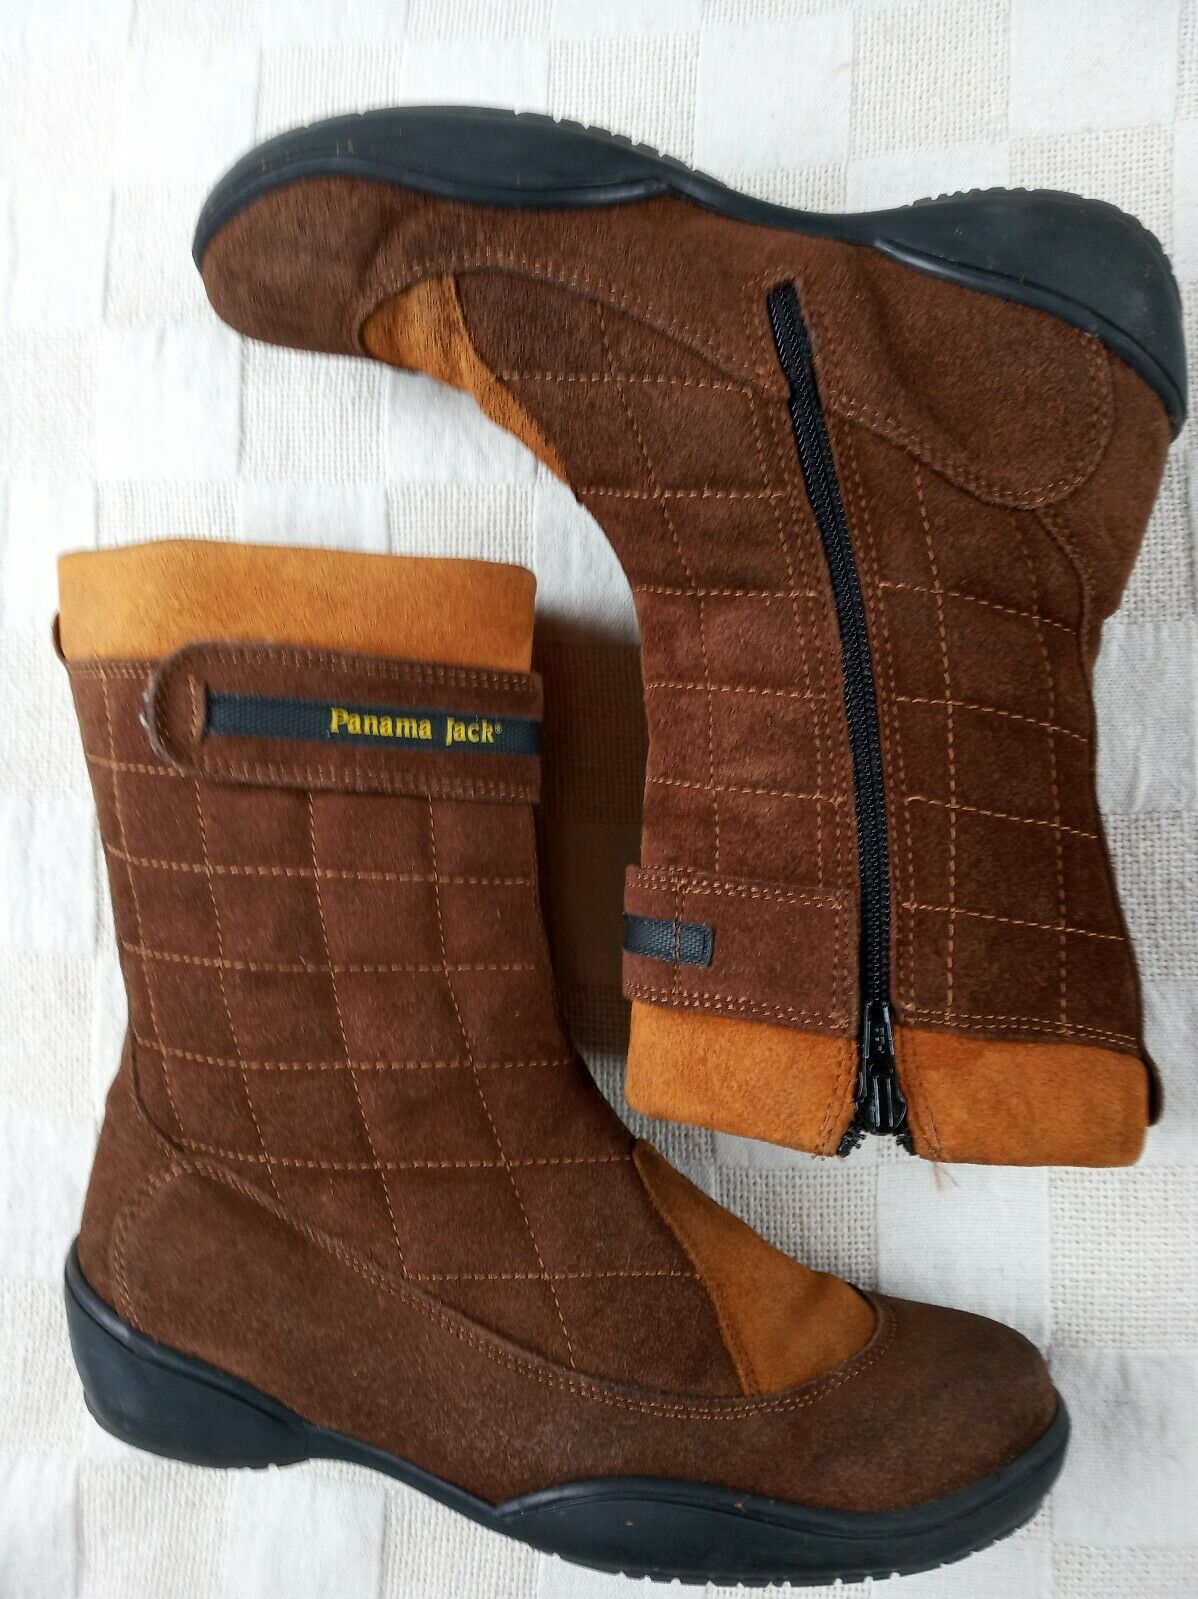 Panama Jack suede brown & orange retro boho boho boho  vintage boots 4 5fc43e